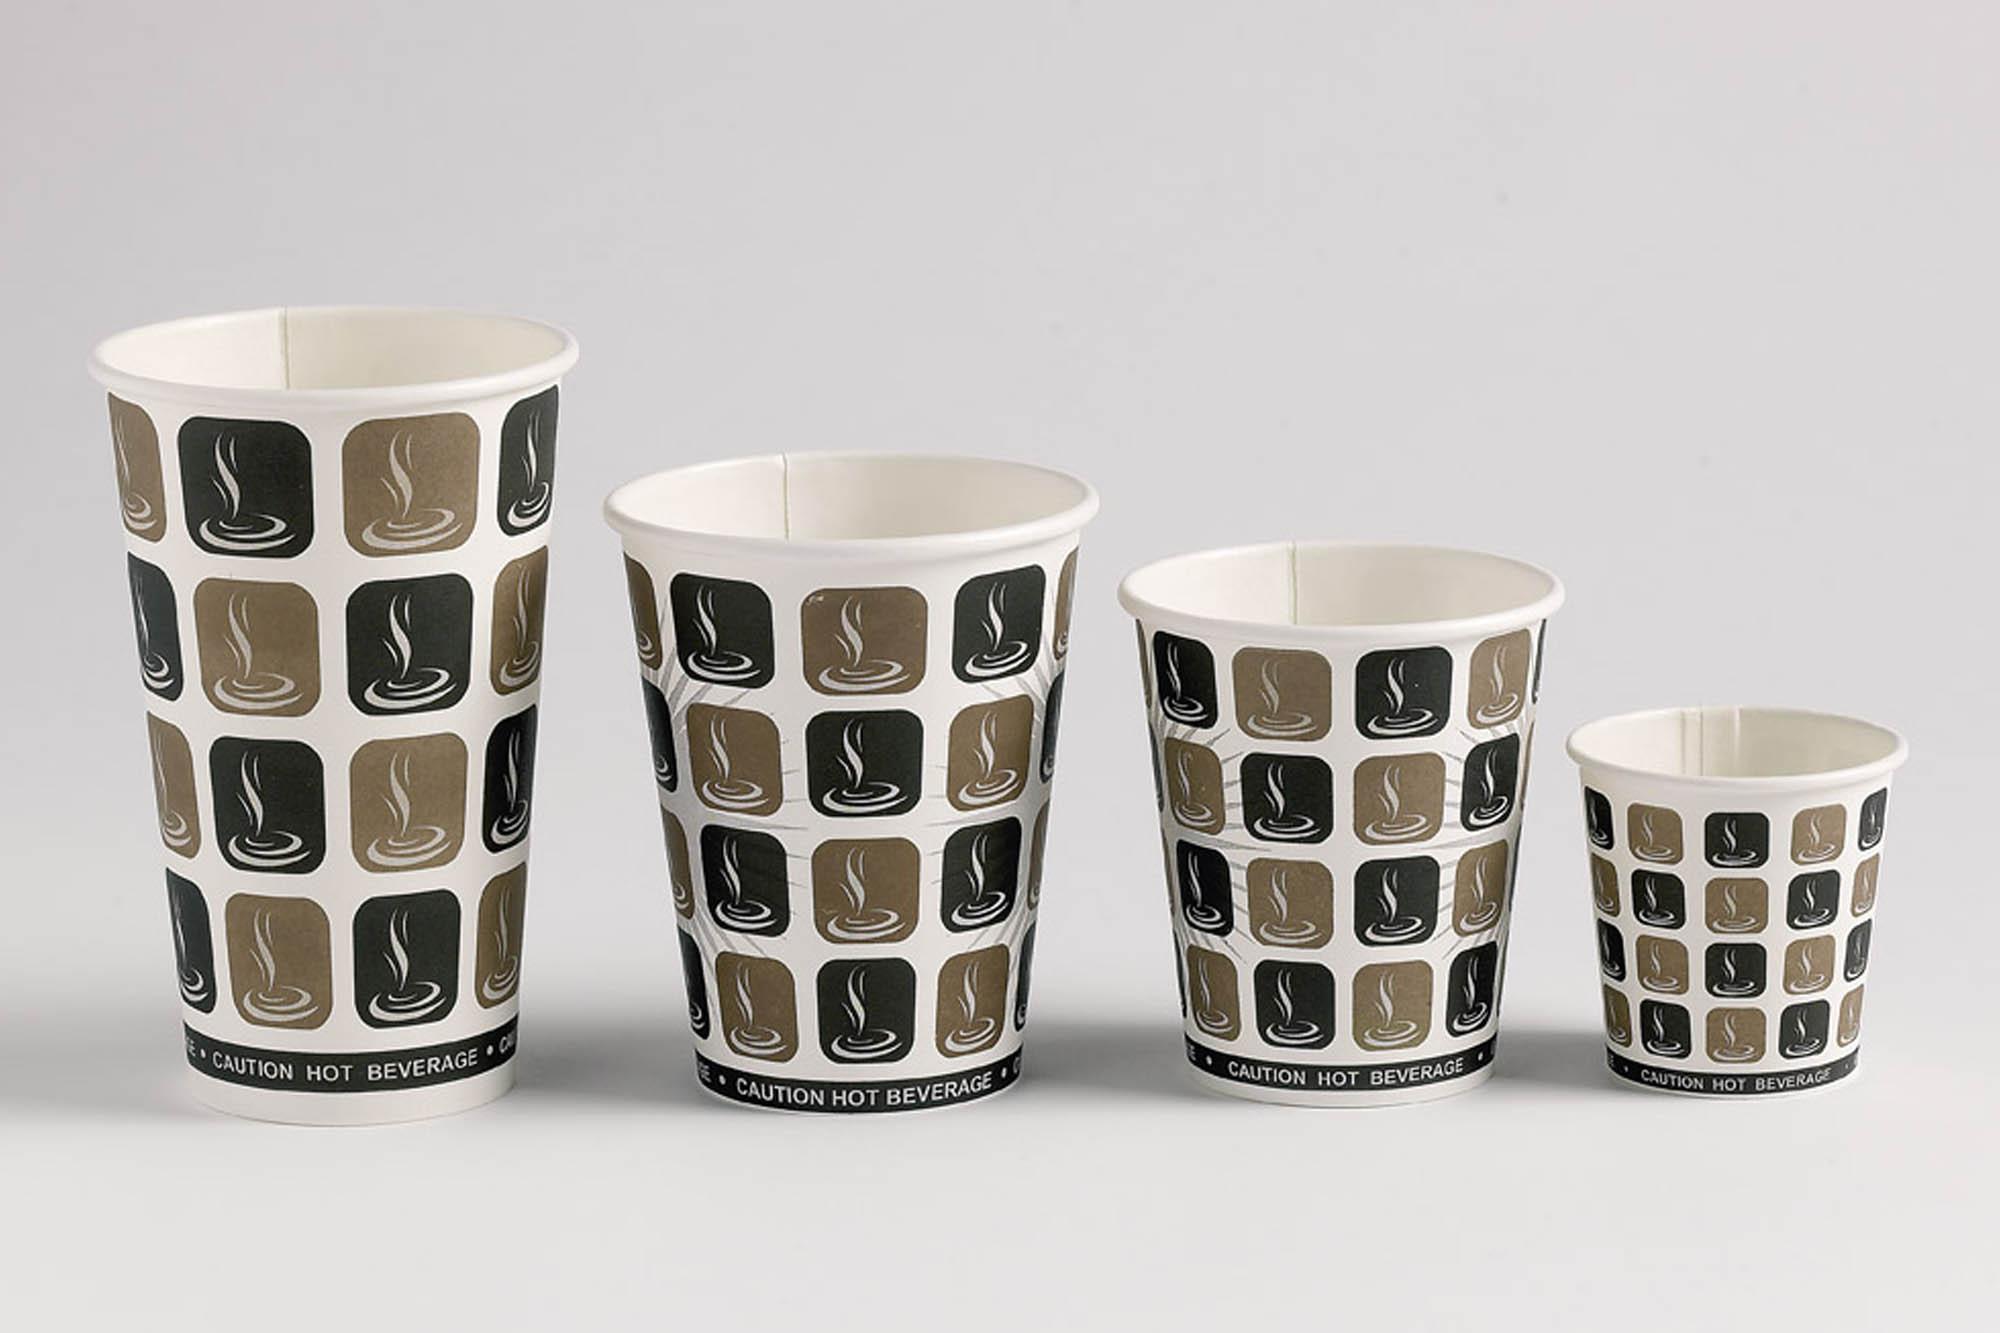 Mocha coffee cups